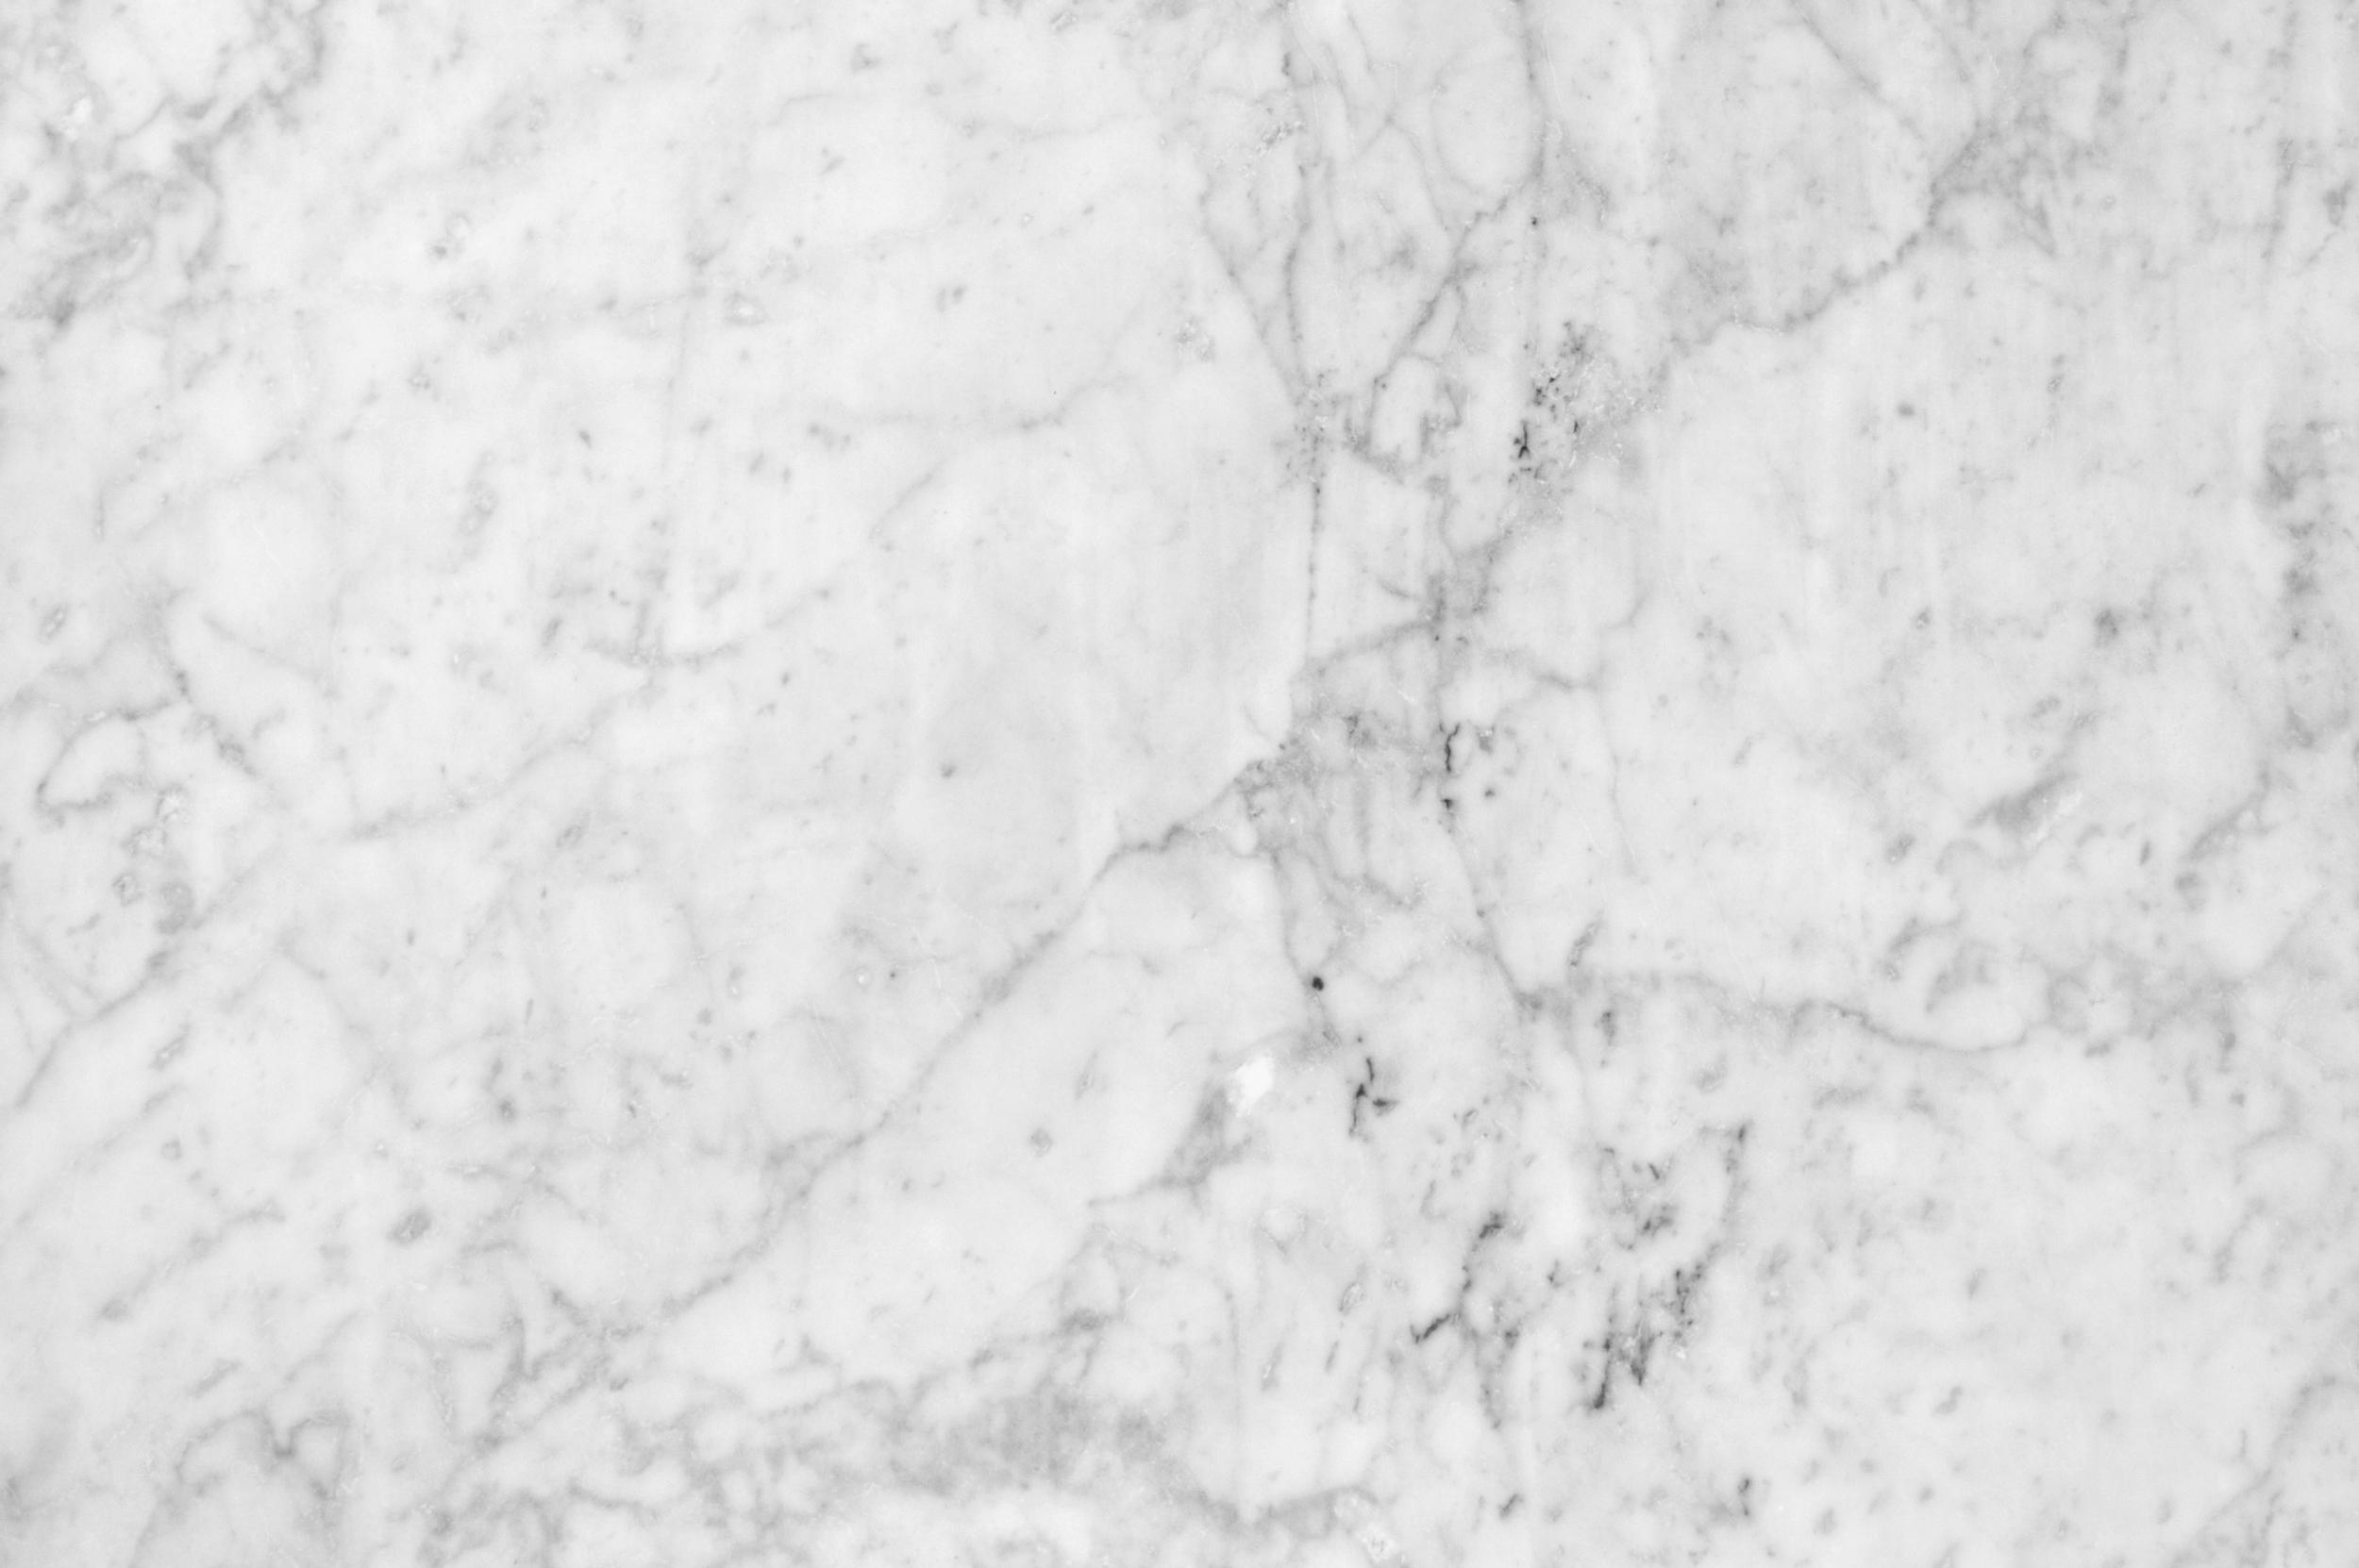 white_marble_texture_by_hugolj-d8a93g7.jpg